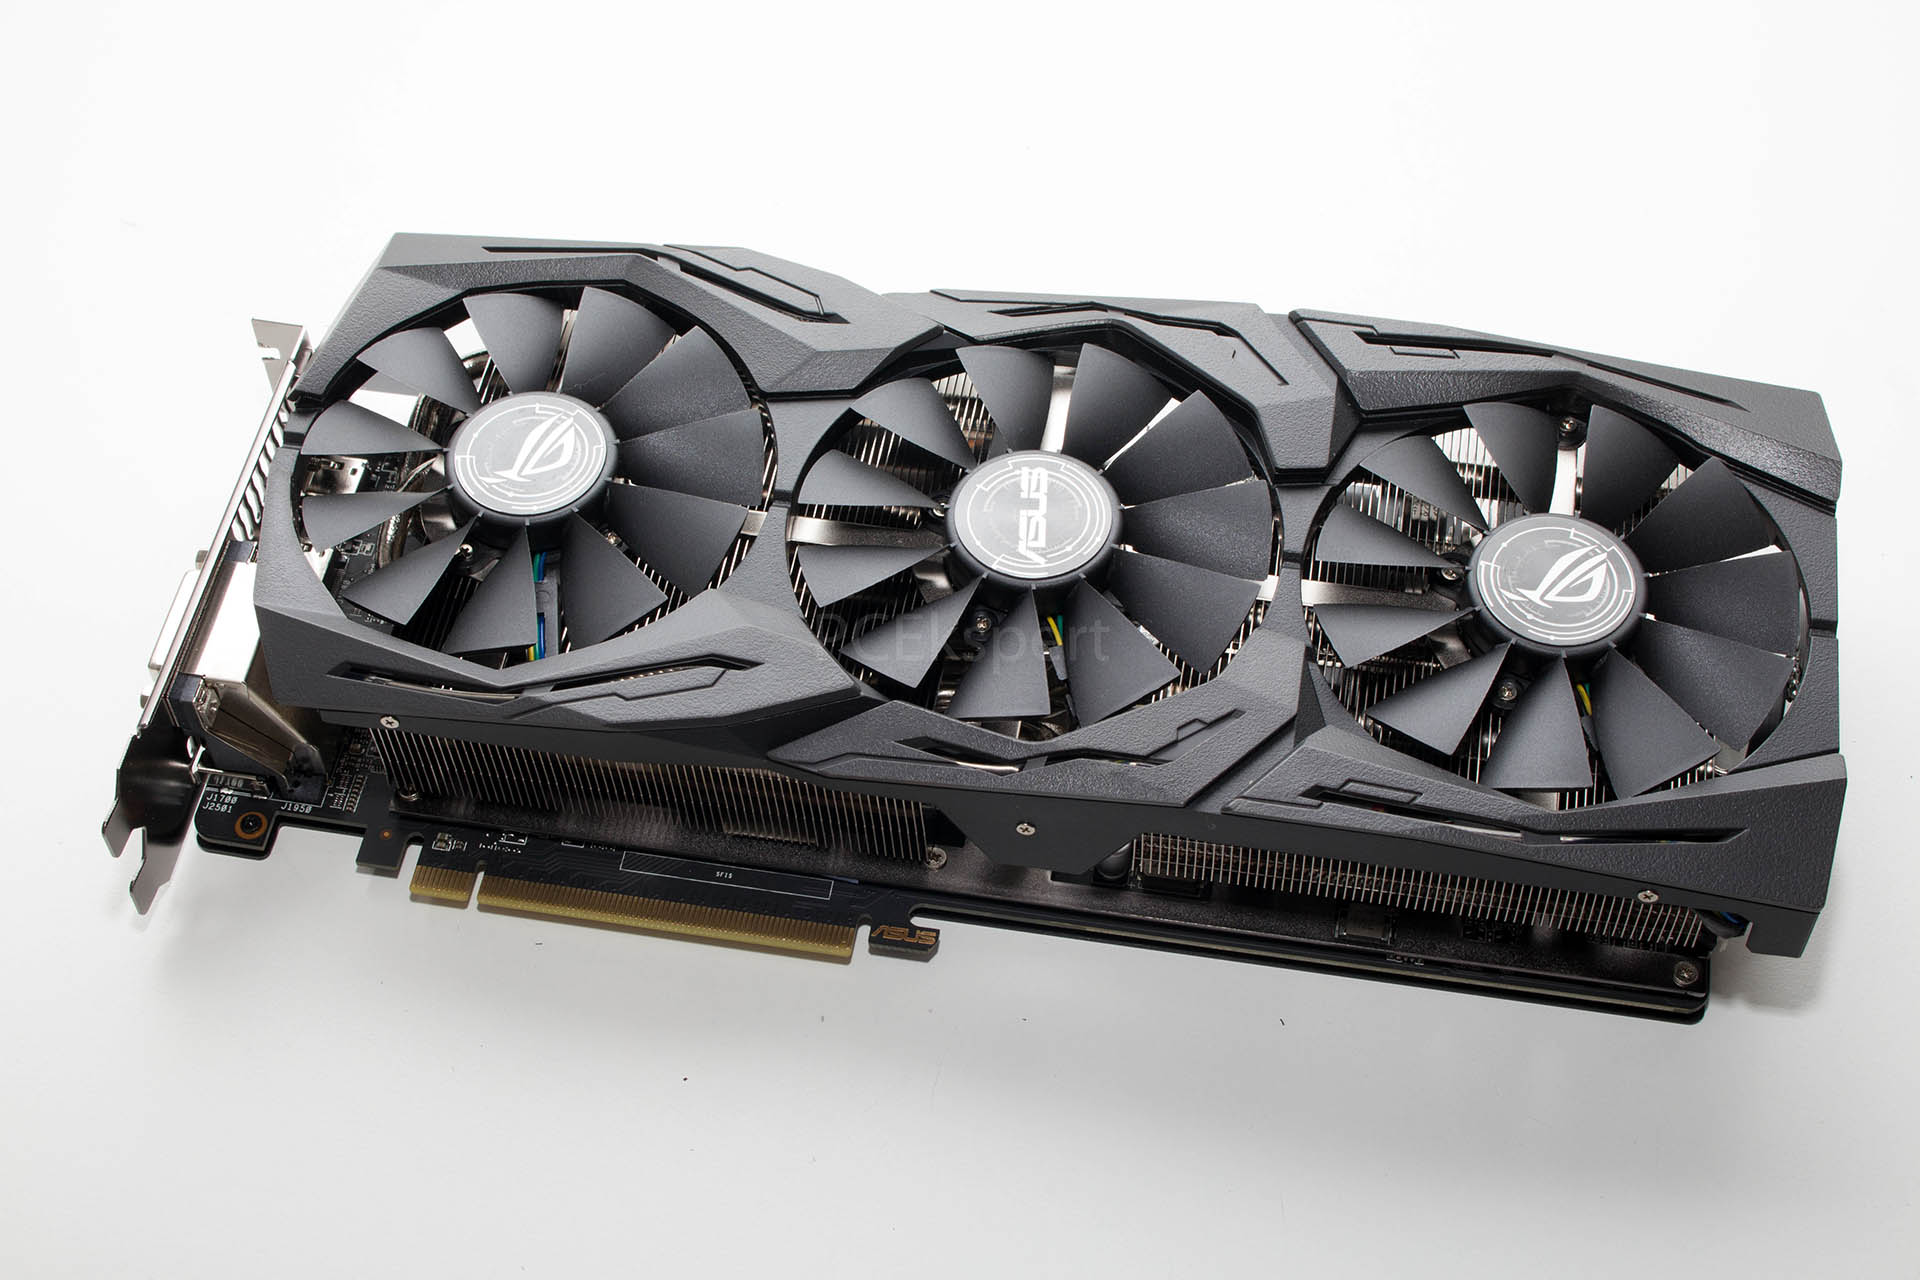 ASUS STRIX RX 580 8GB TOP Gaming recenzija i CrossFire testovi